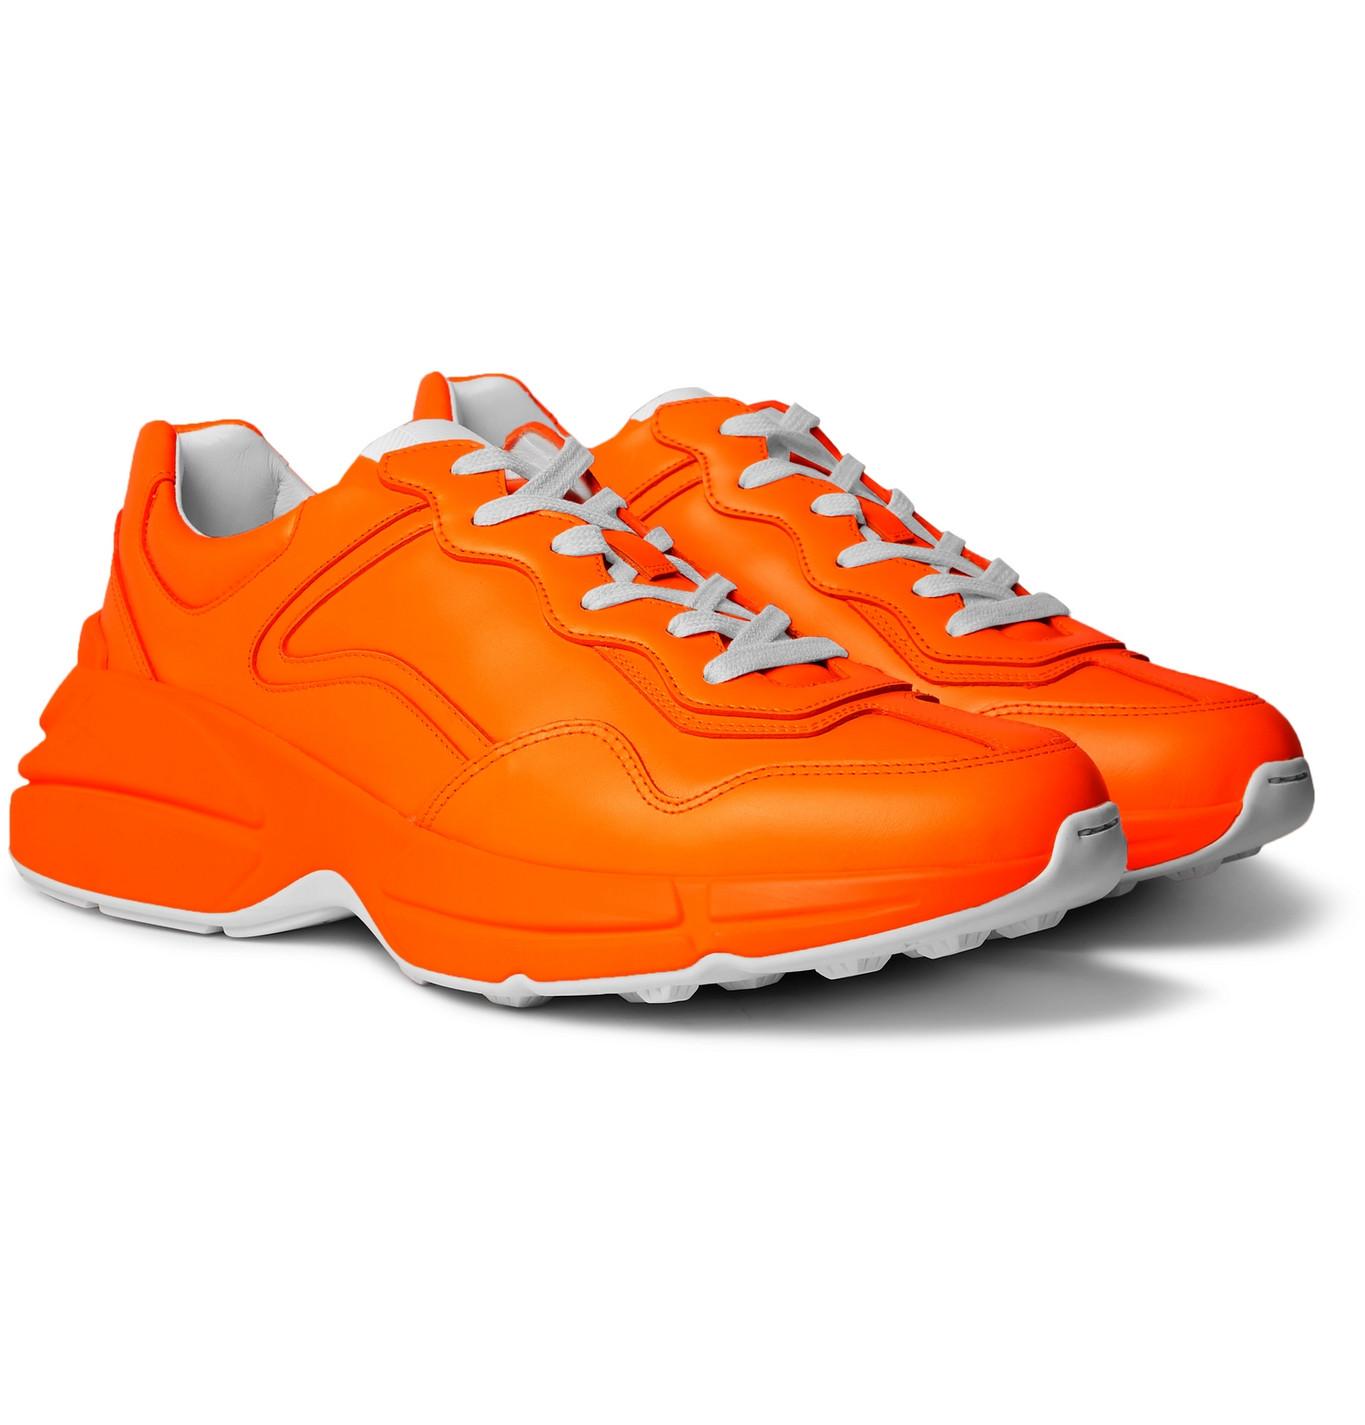 Gucci - Rhyton Leather Sneakers - Men - Orange   The ...